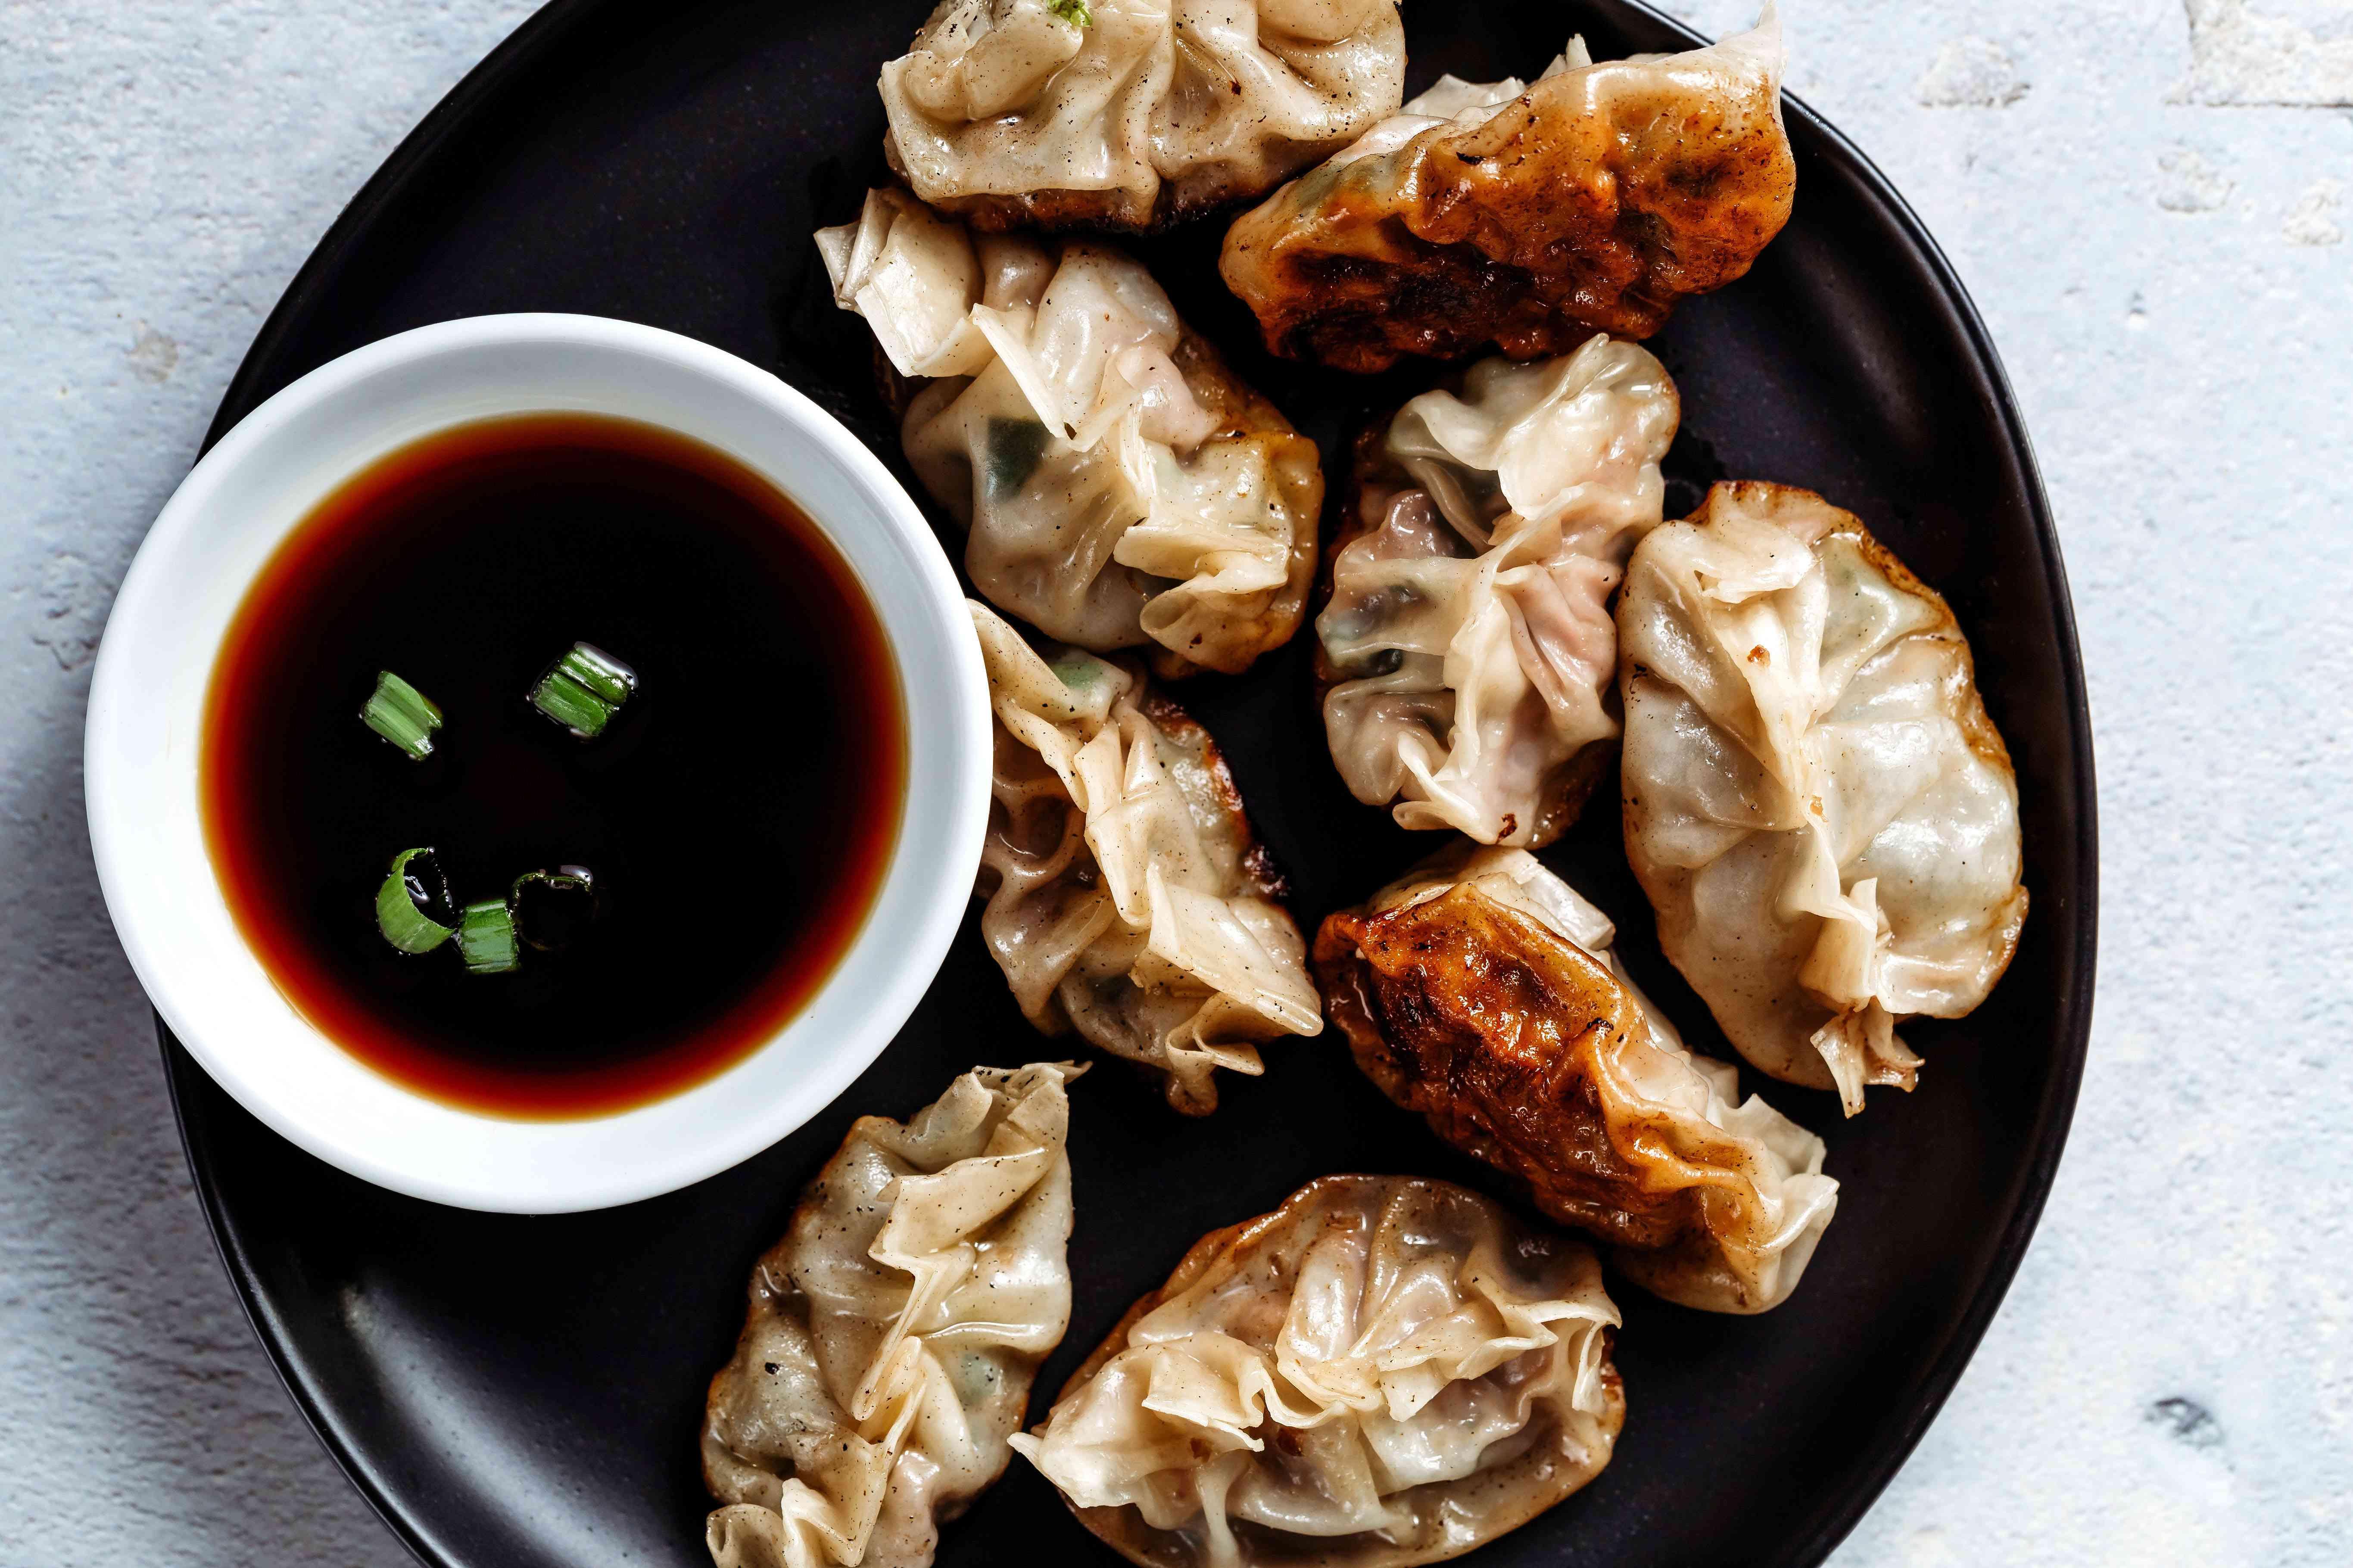 Chinese Pan-Fried Dumplings